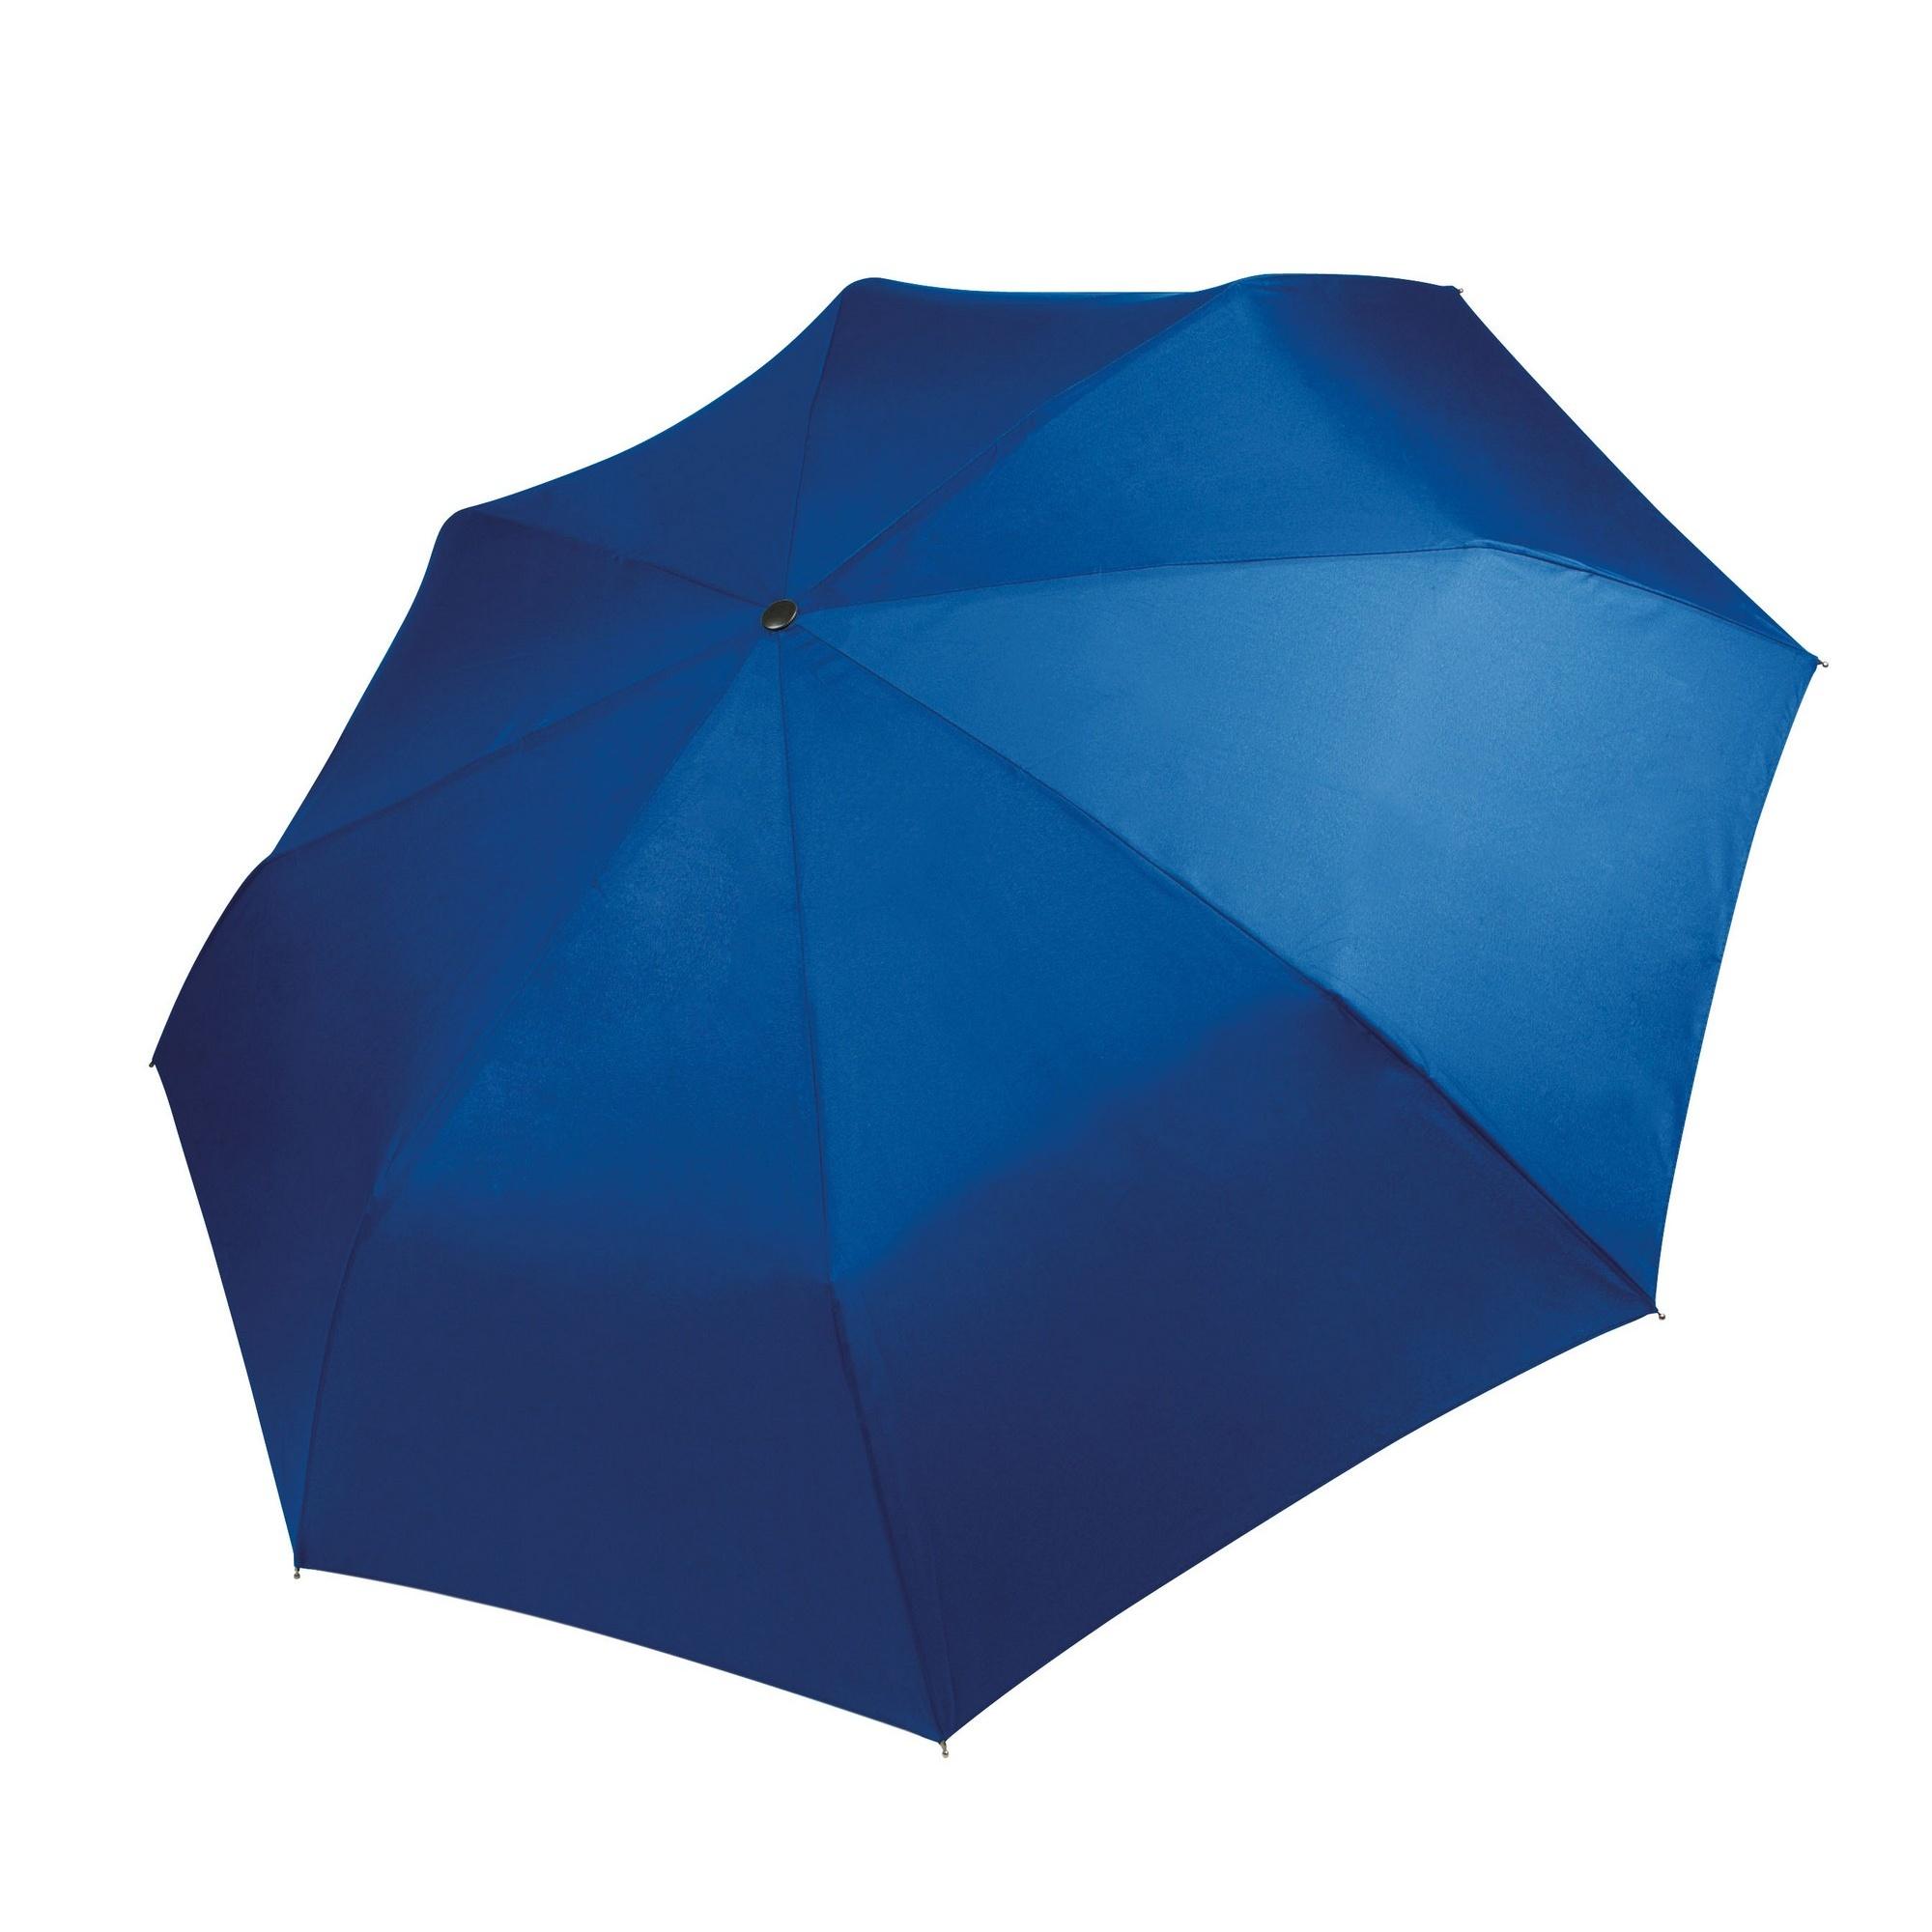 Kimood Foldable Handbag Umbrella (Pack of 2) (One Size) (Royal Blue)